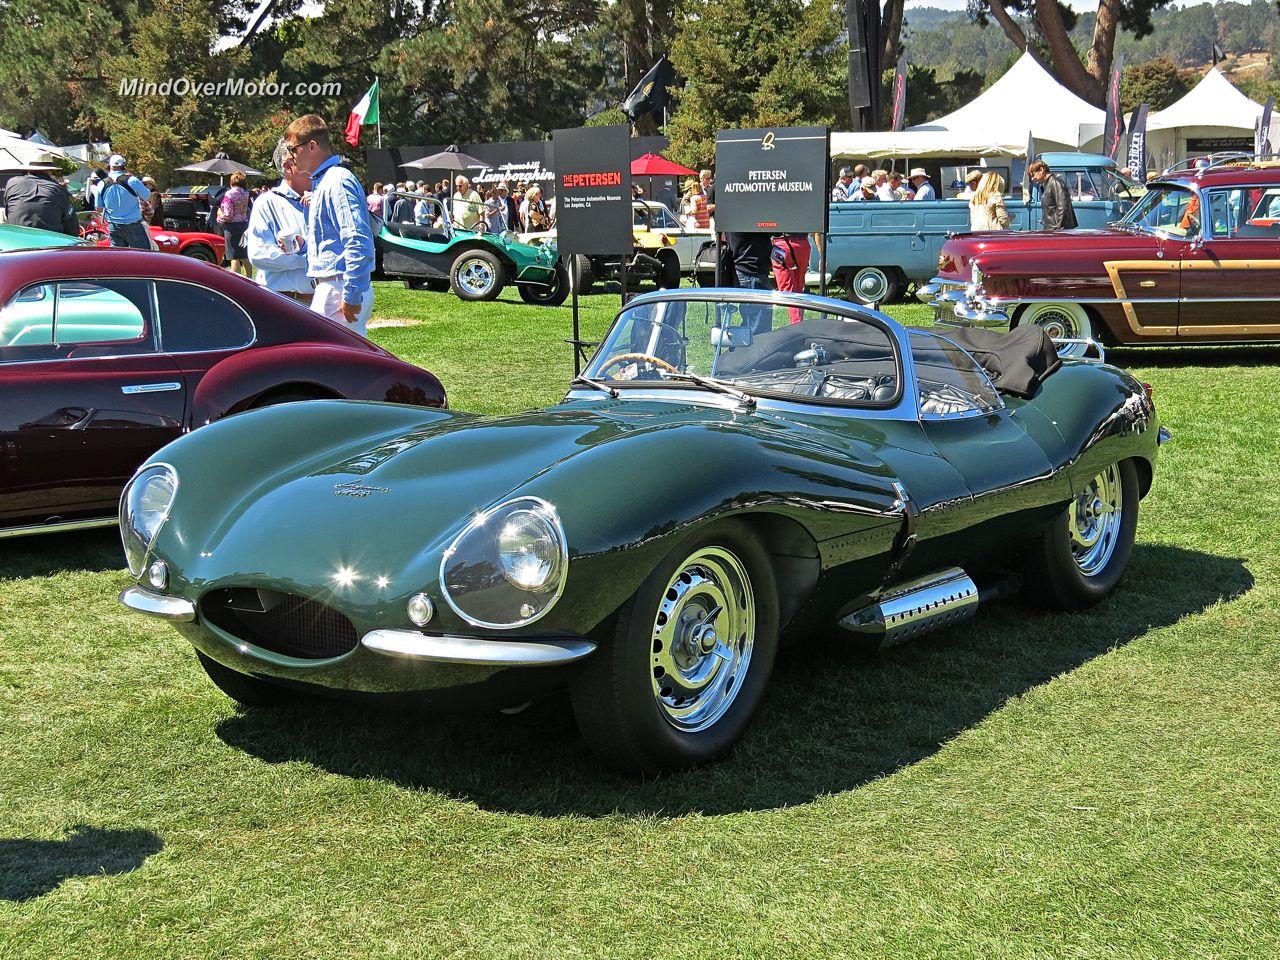 Steve McQueen's Jaguar XK-SS at The Quail